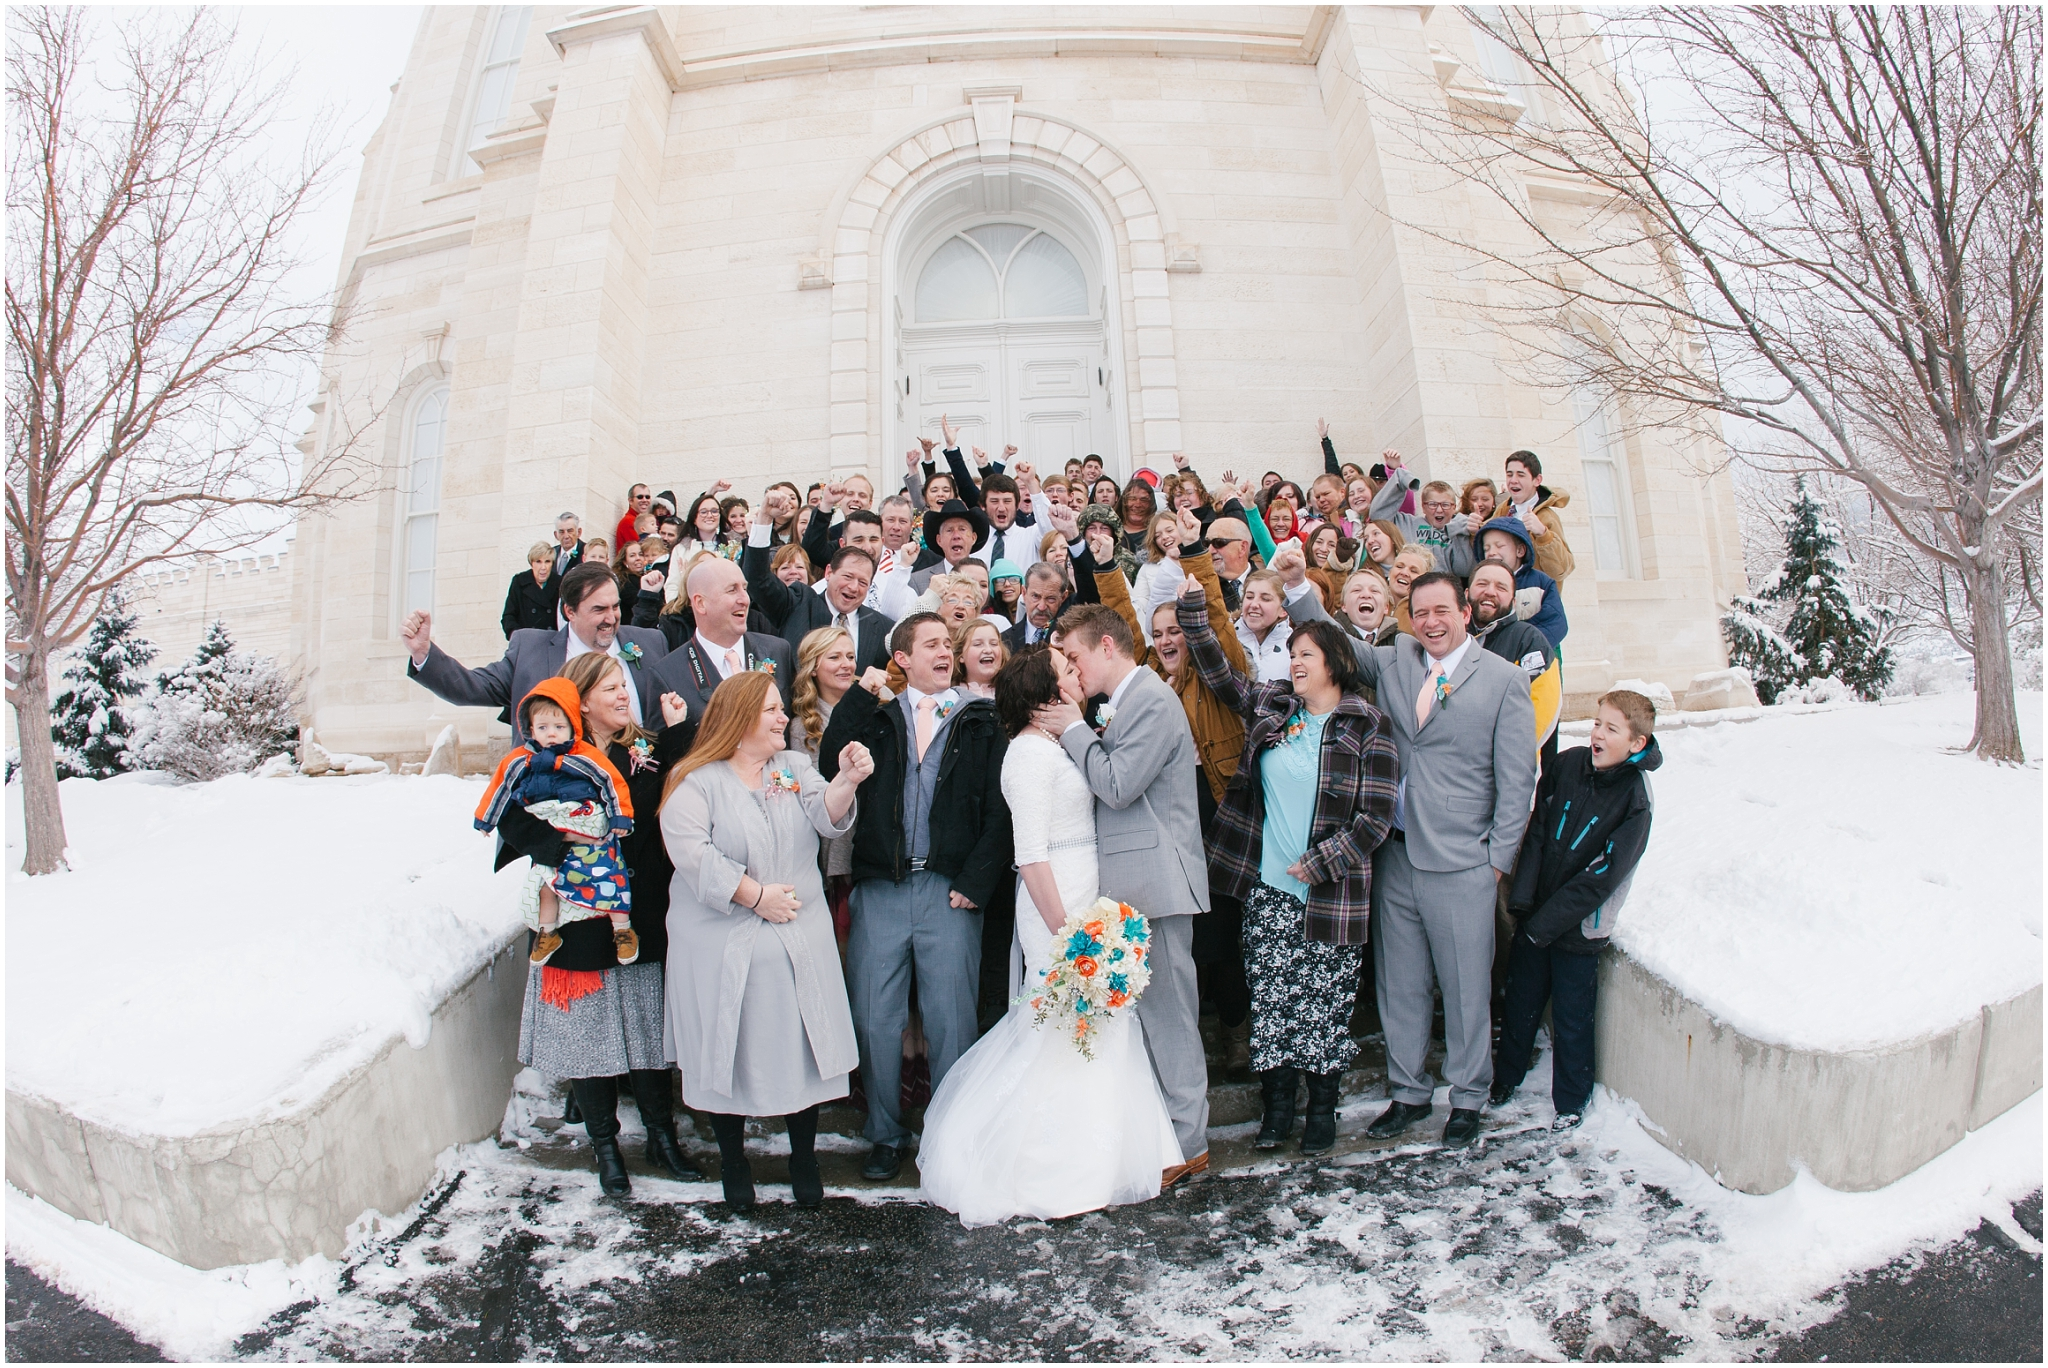 Bo Alyssa Wedding-562_Lizzie-B-Imagery-Utah-Wedding-Photographer-Central-Utah-Photographer-Utah-County-Manti-Temple.jpg